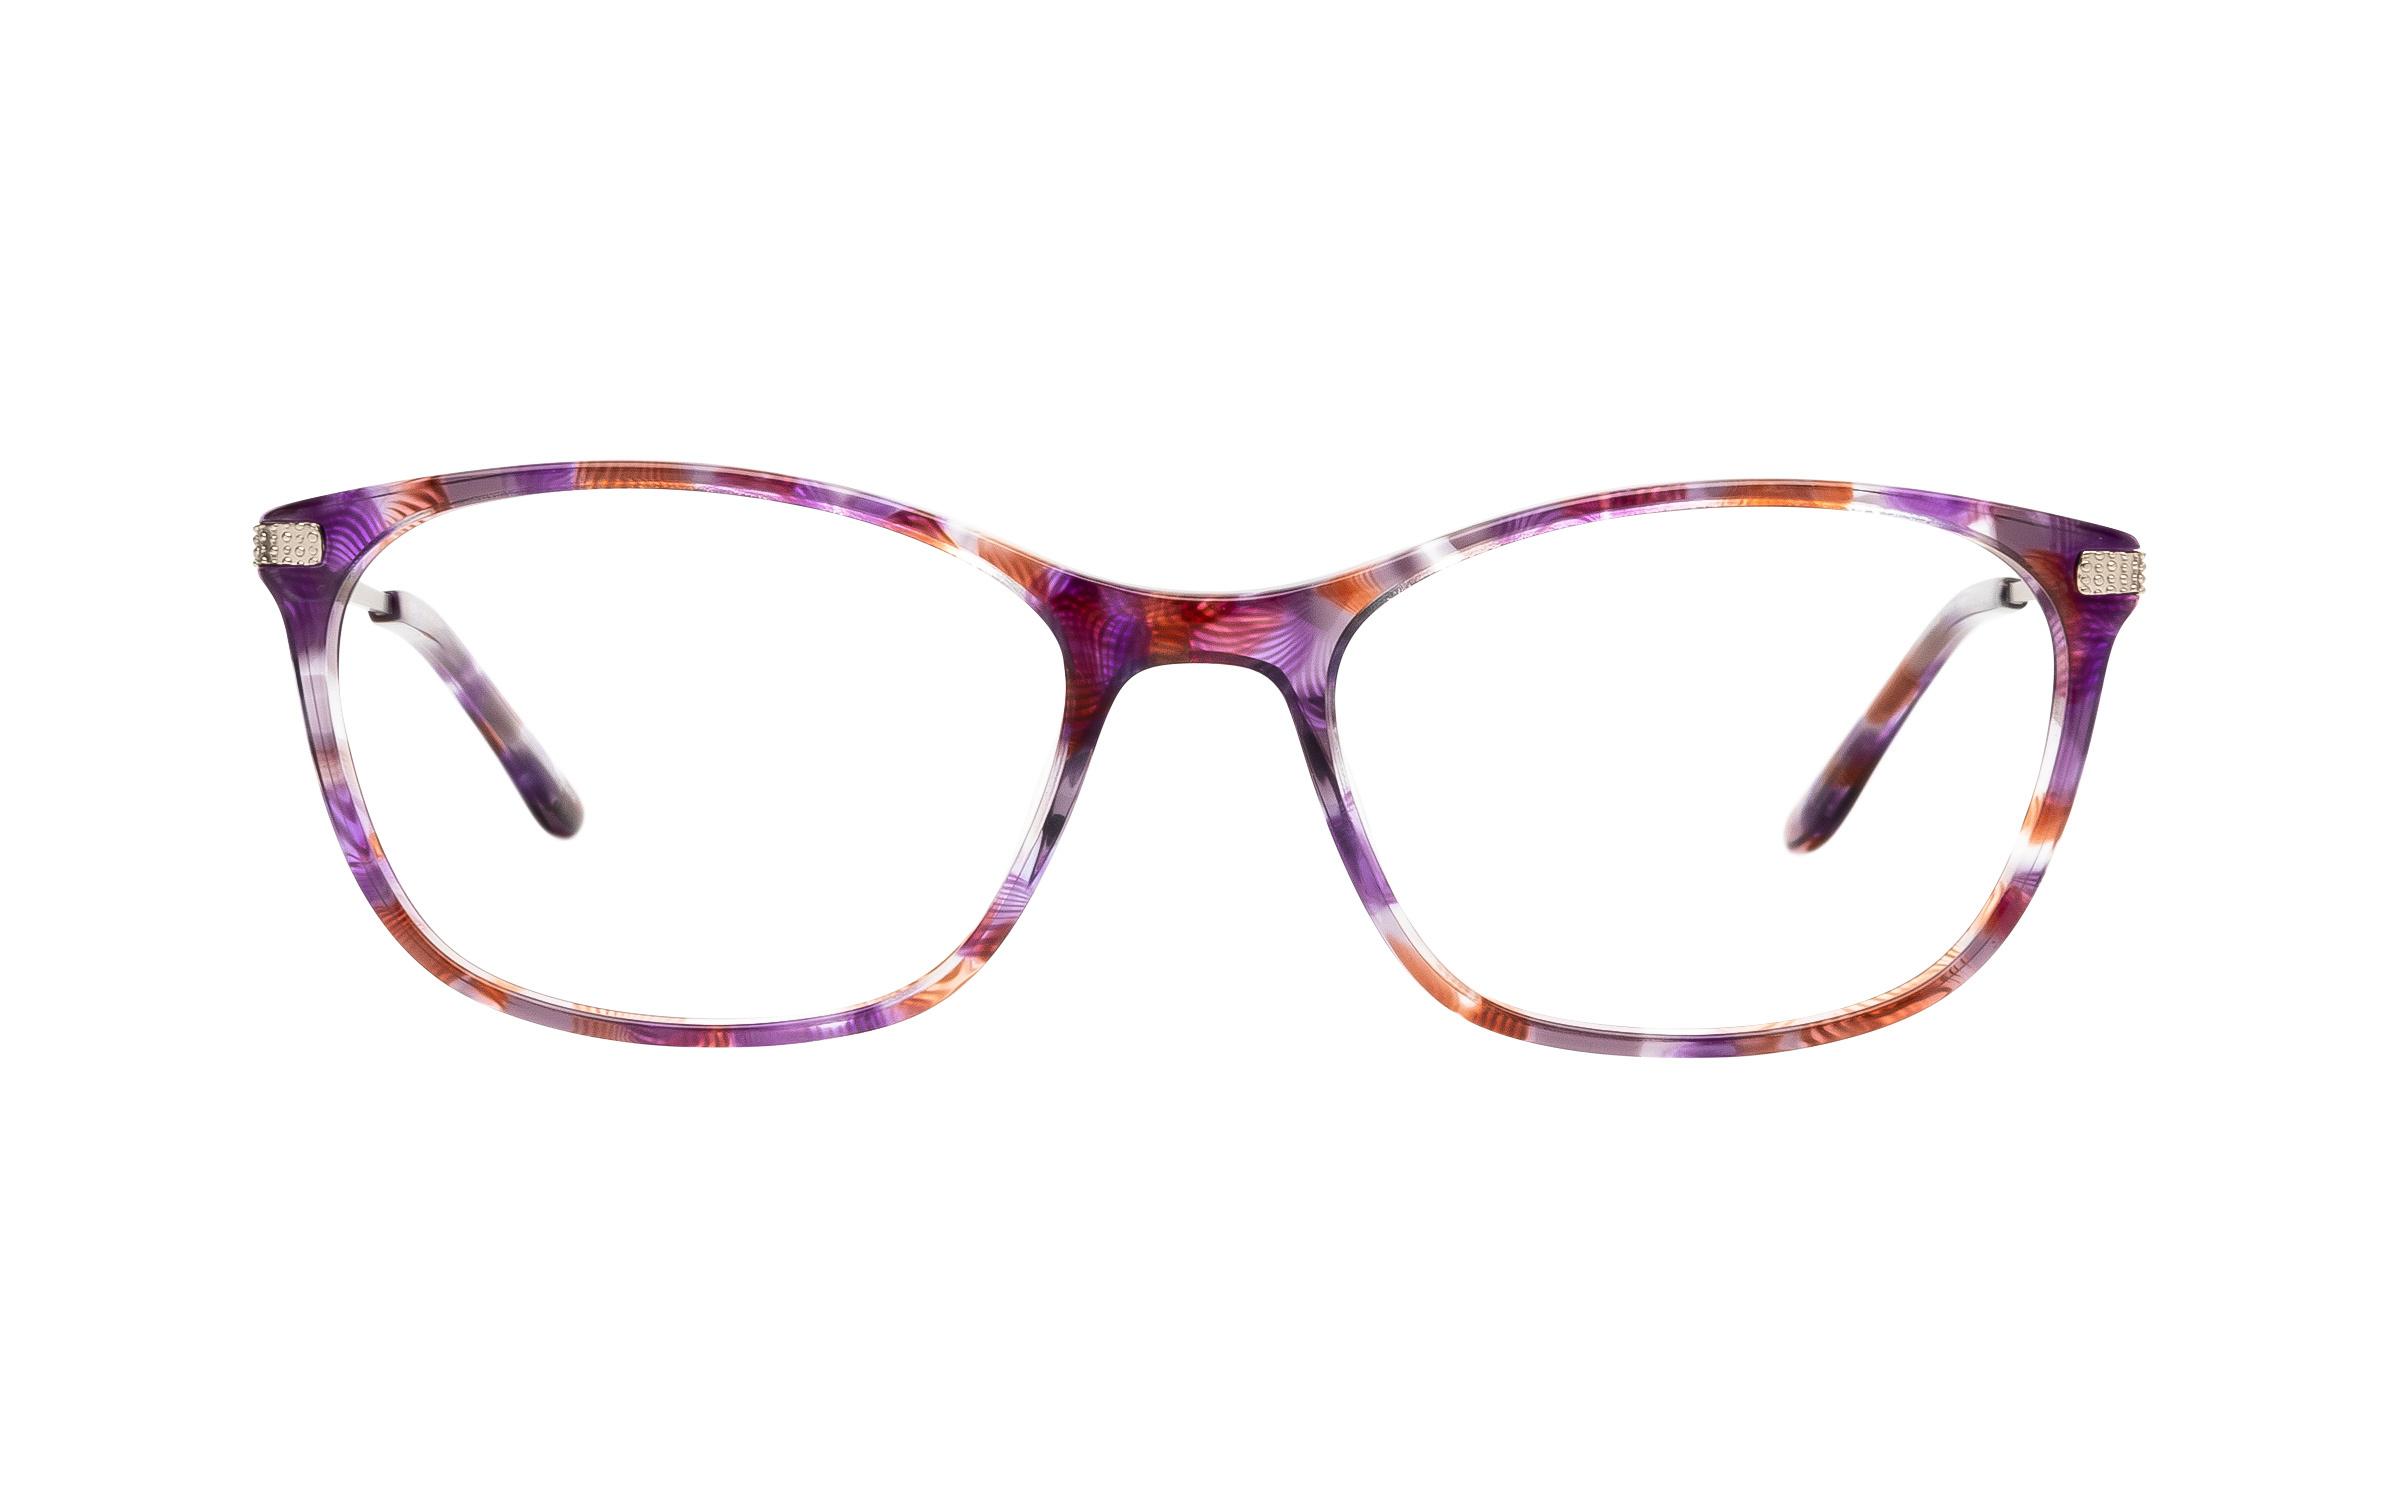 Kam Dhillon Veronica (53) Eyeglasses and Frame in Purple Havana Tortoise/Purple | Acetate/Metal